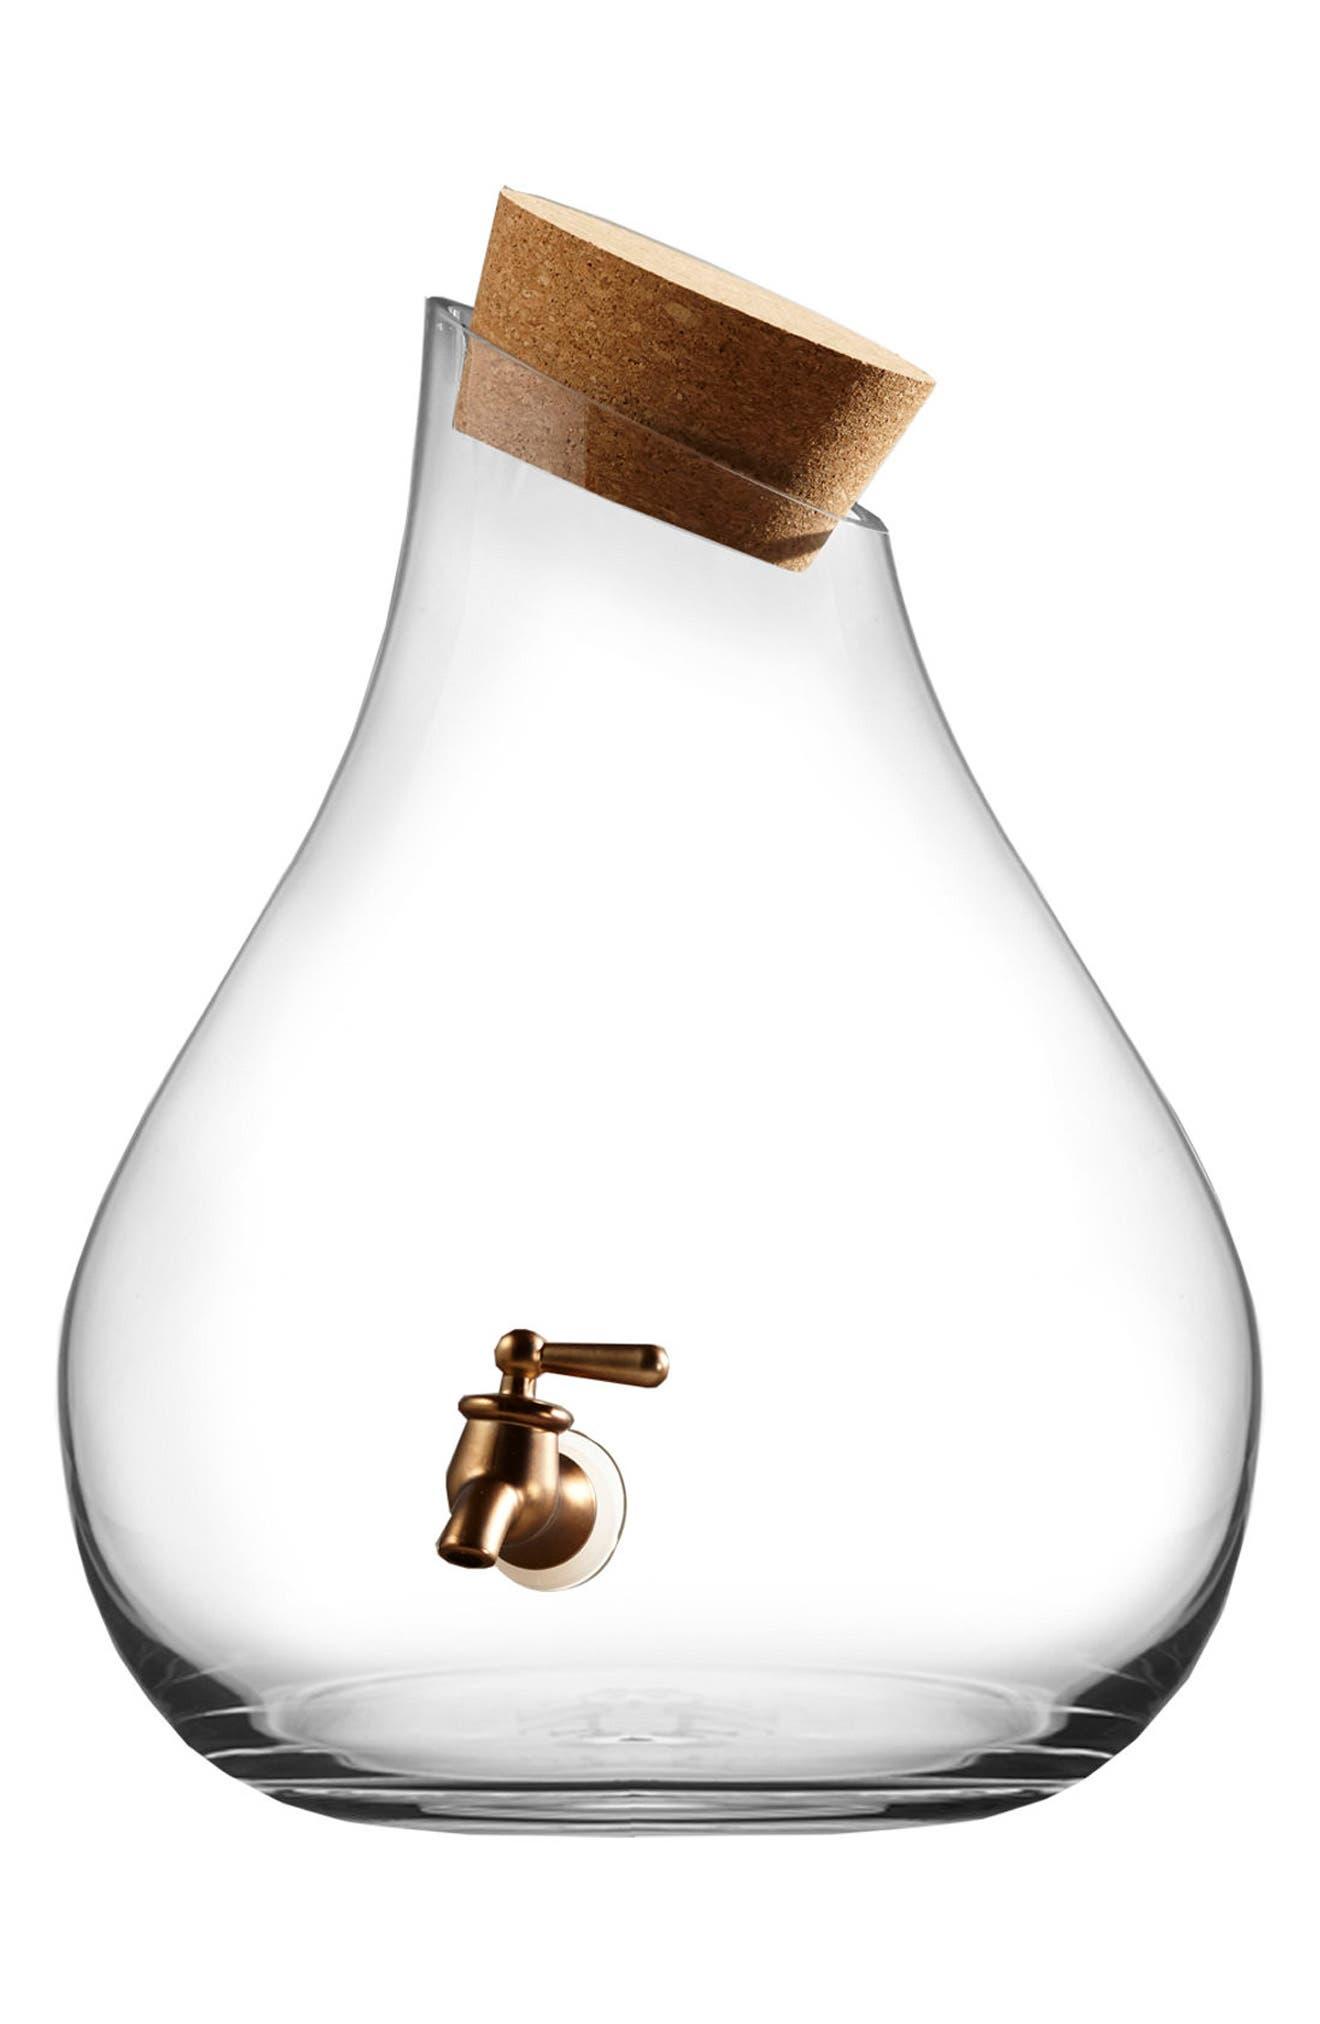 American Atelier 2.5-Gallon Beverage Dispenser